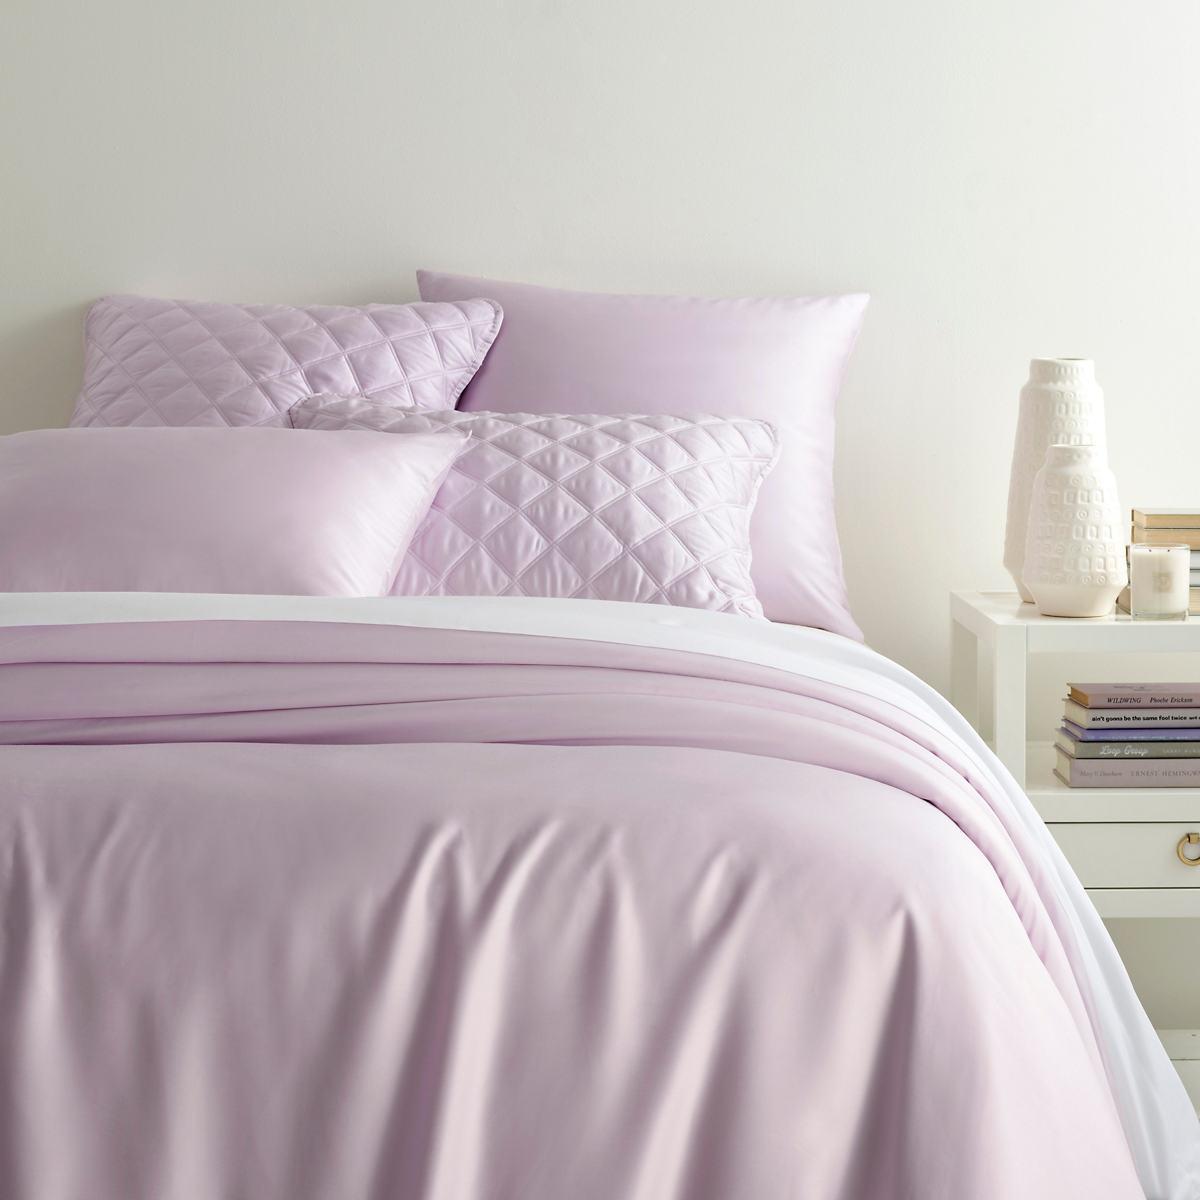 Silken Solid Pale Lilac Duvet Cover